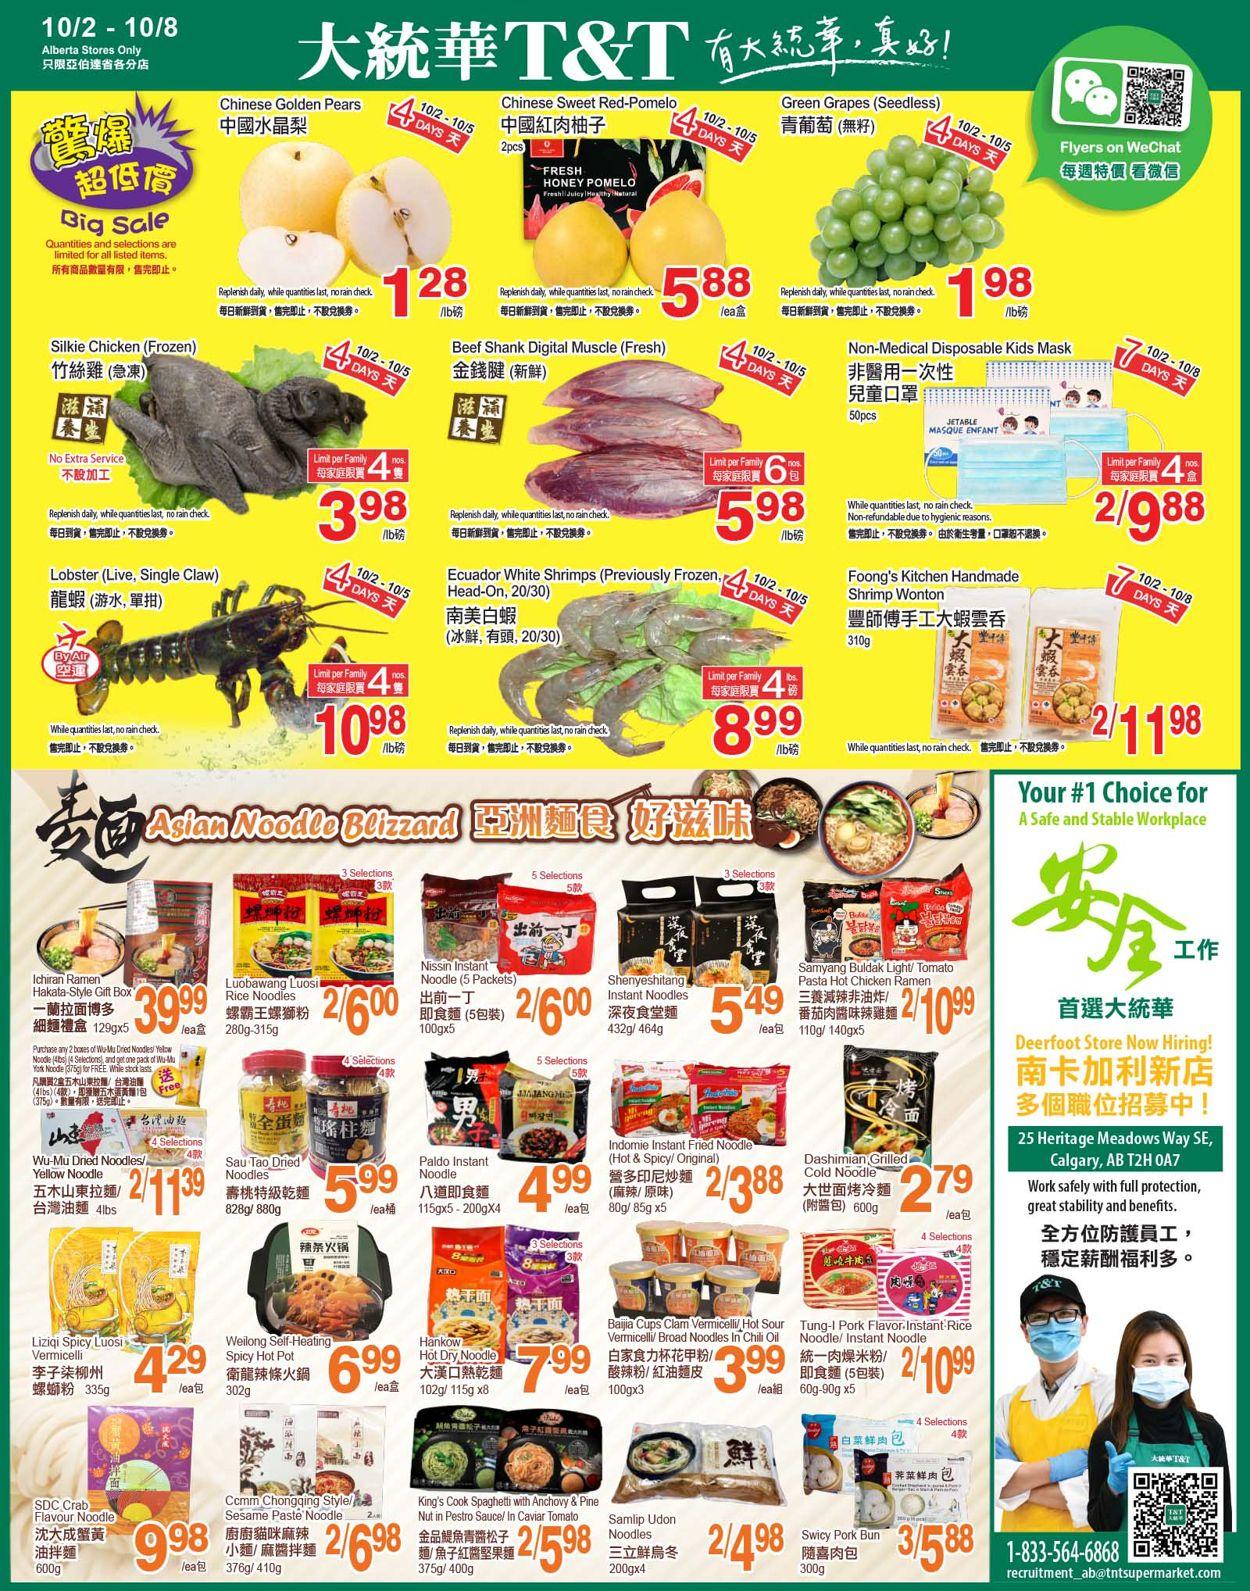 T&T Supermarket - Alberta Flyer - 10/02-10/08/2020